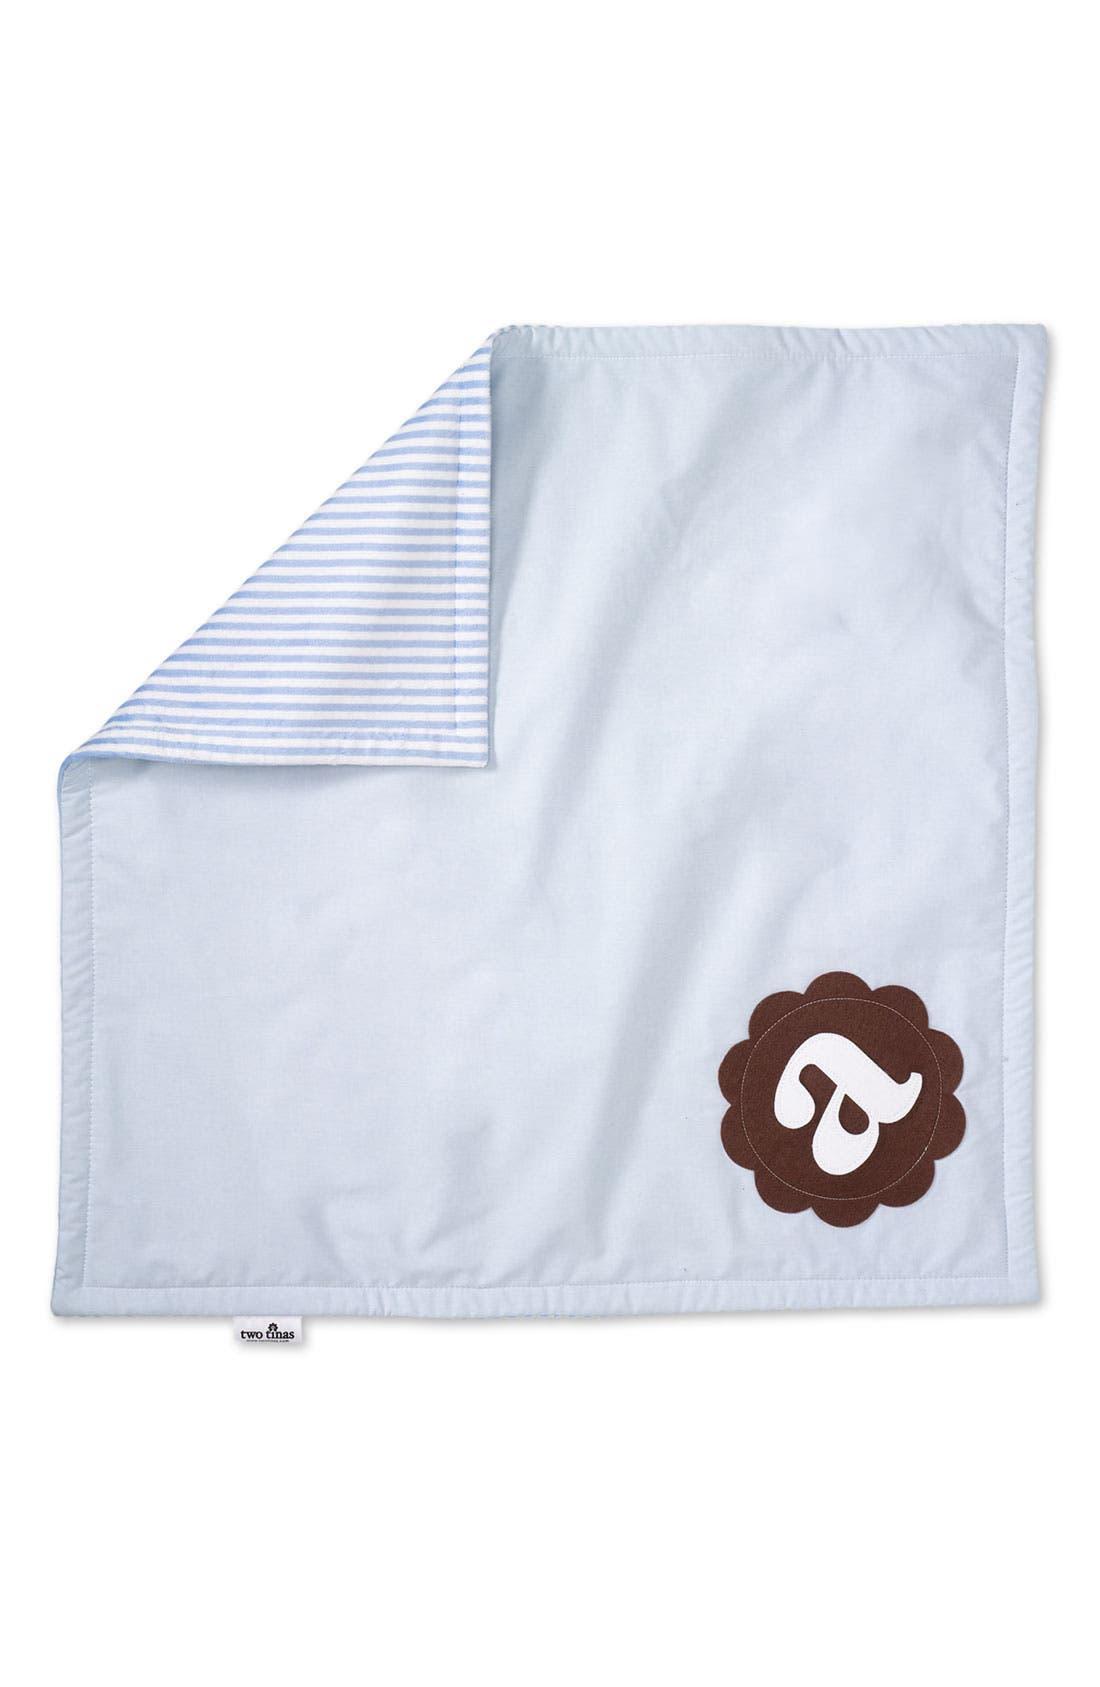 Main Image - Two Tinas Initial Blanket